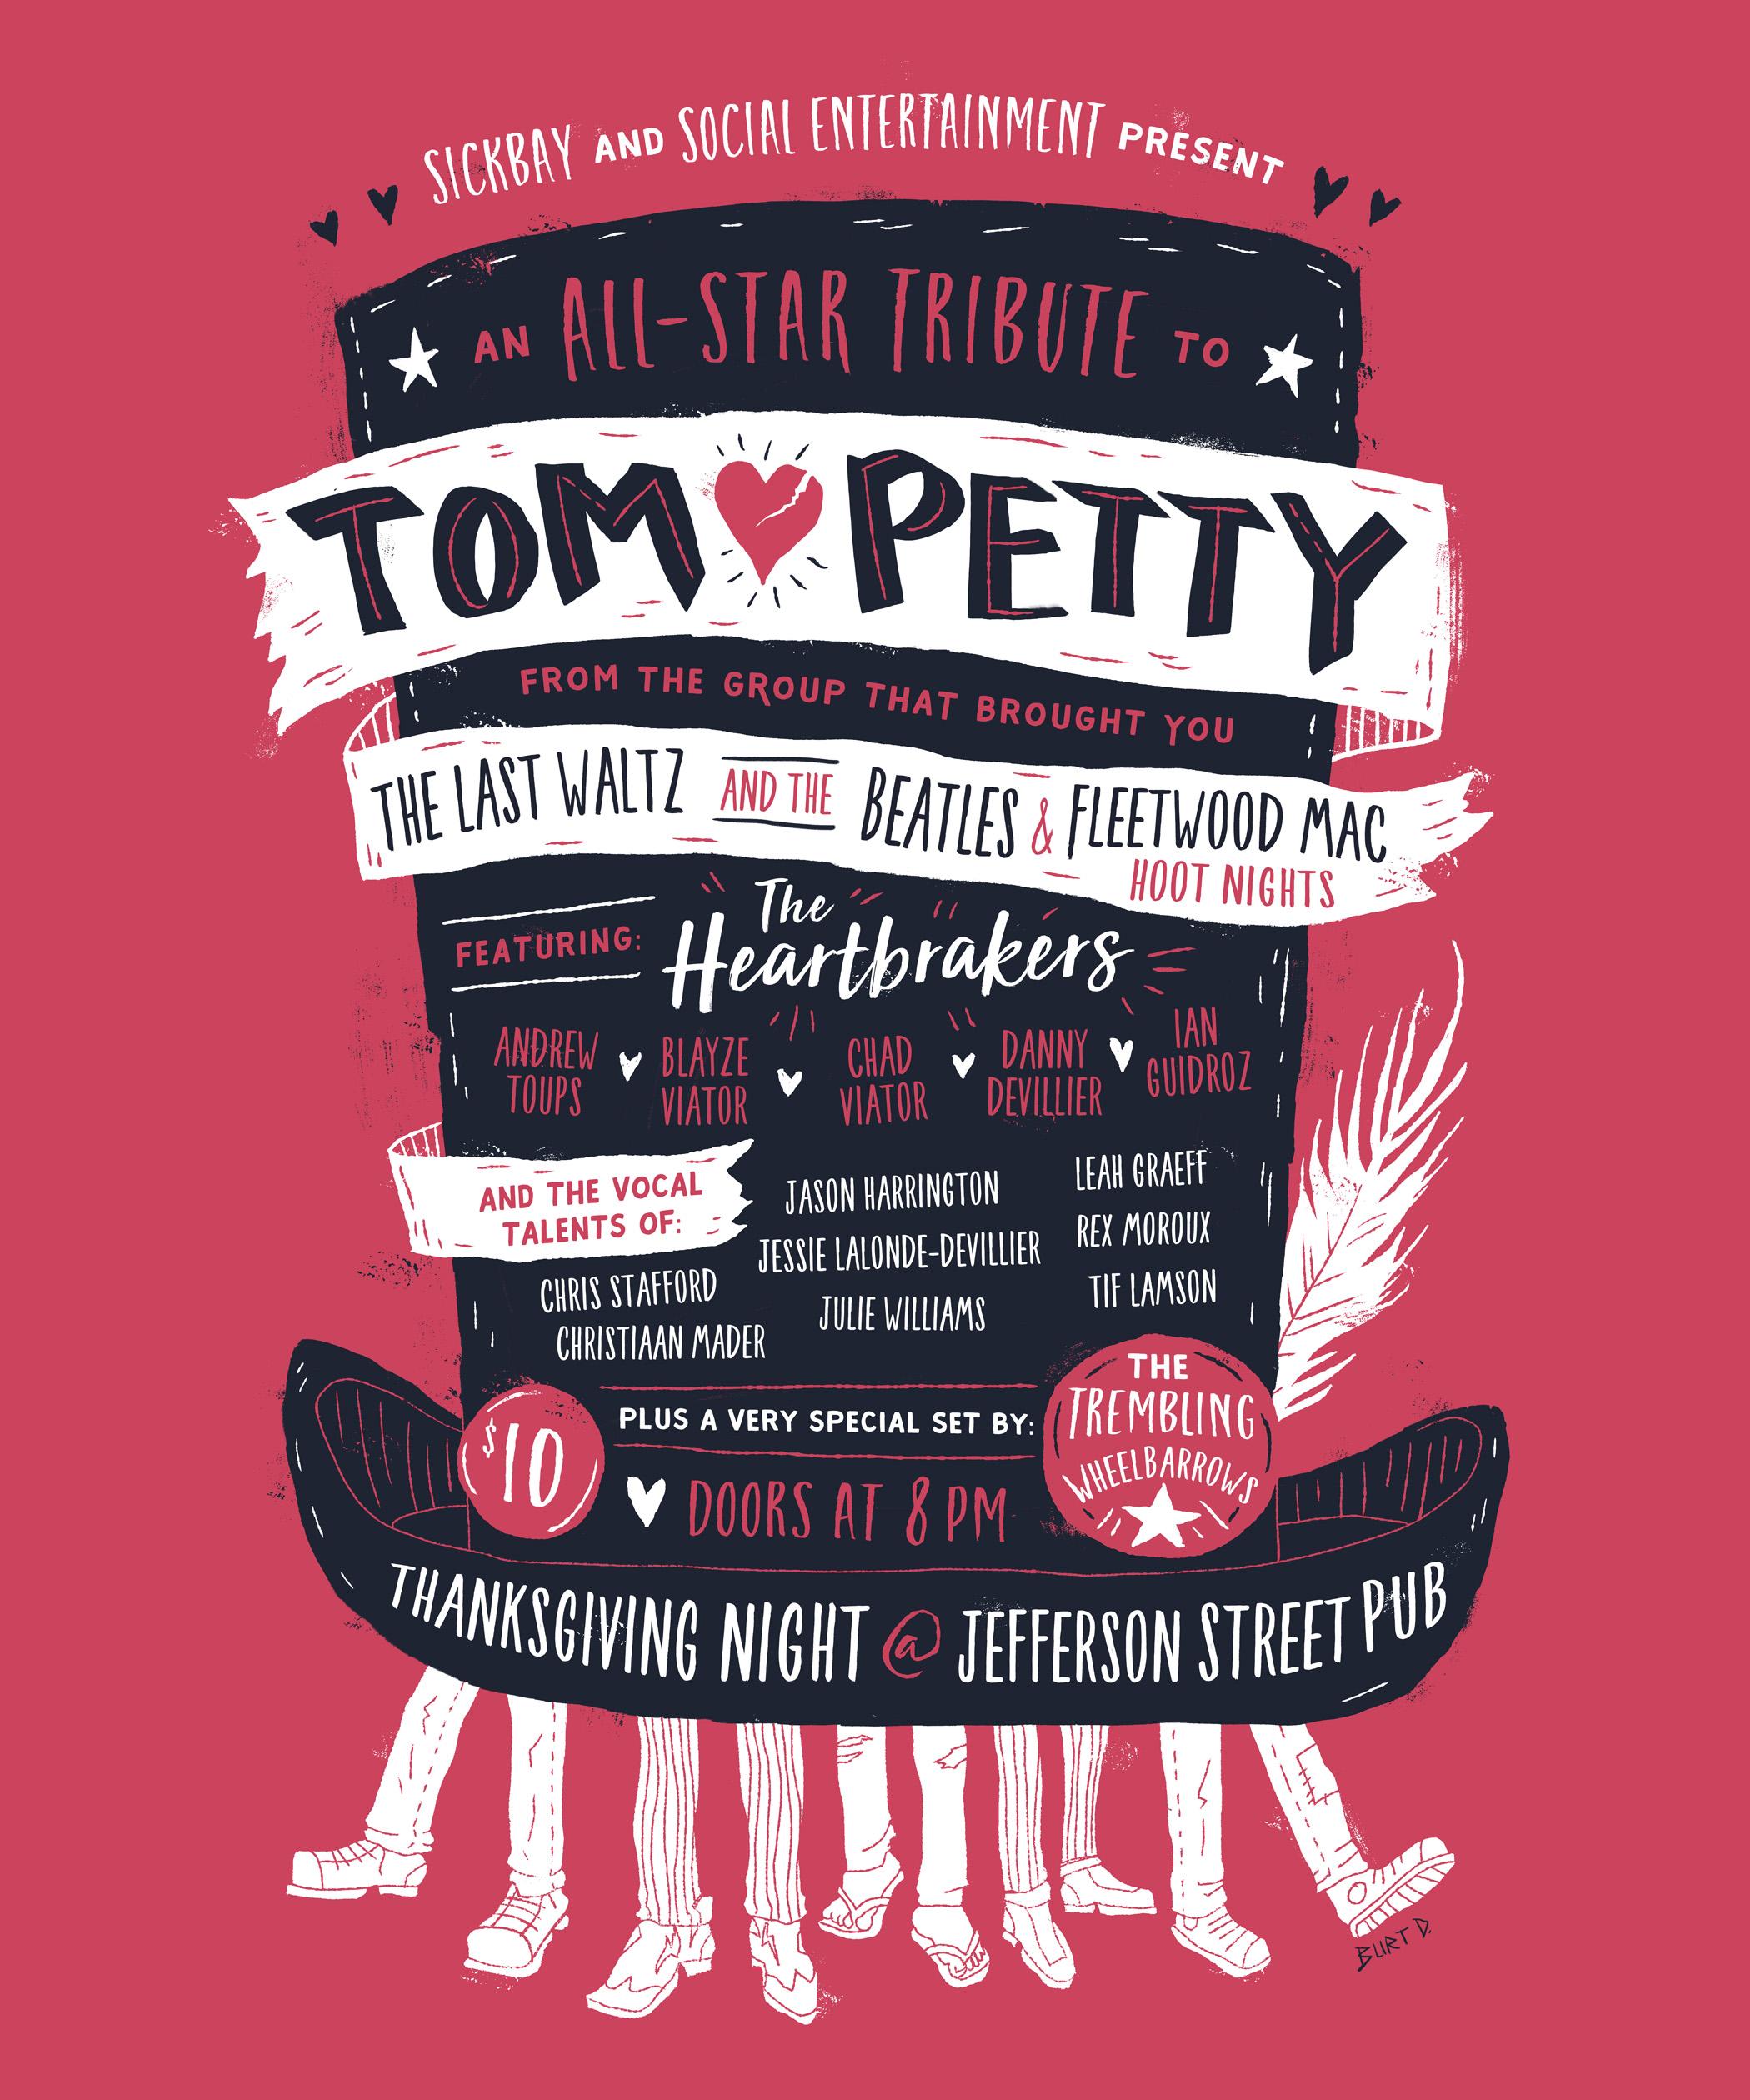 Tom Petty All-Star Tribute